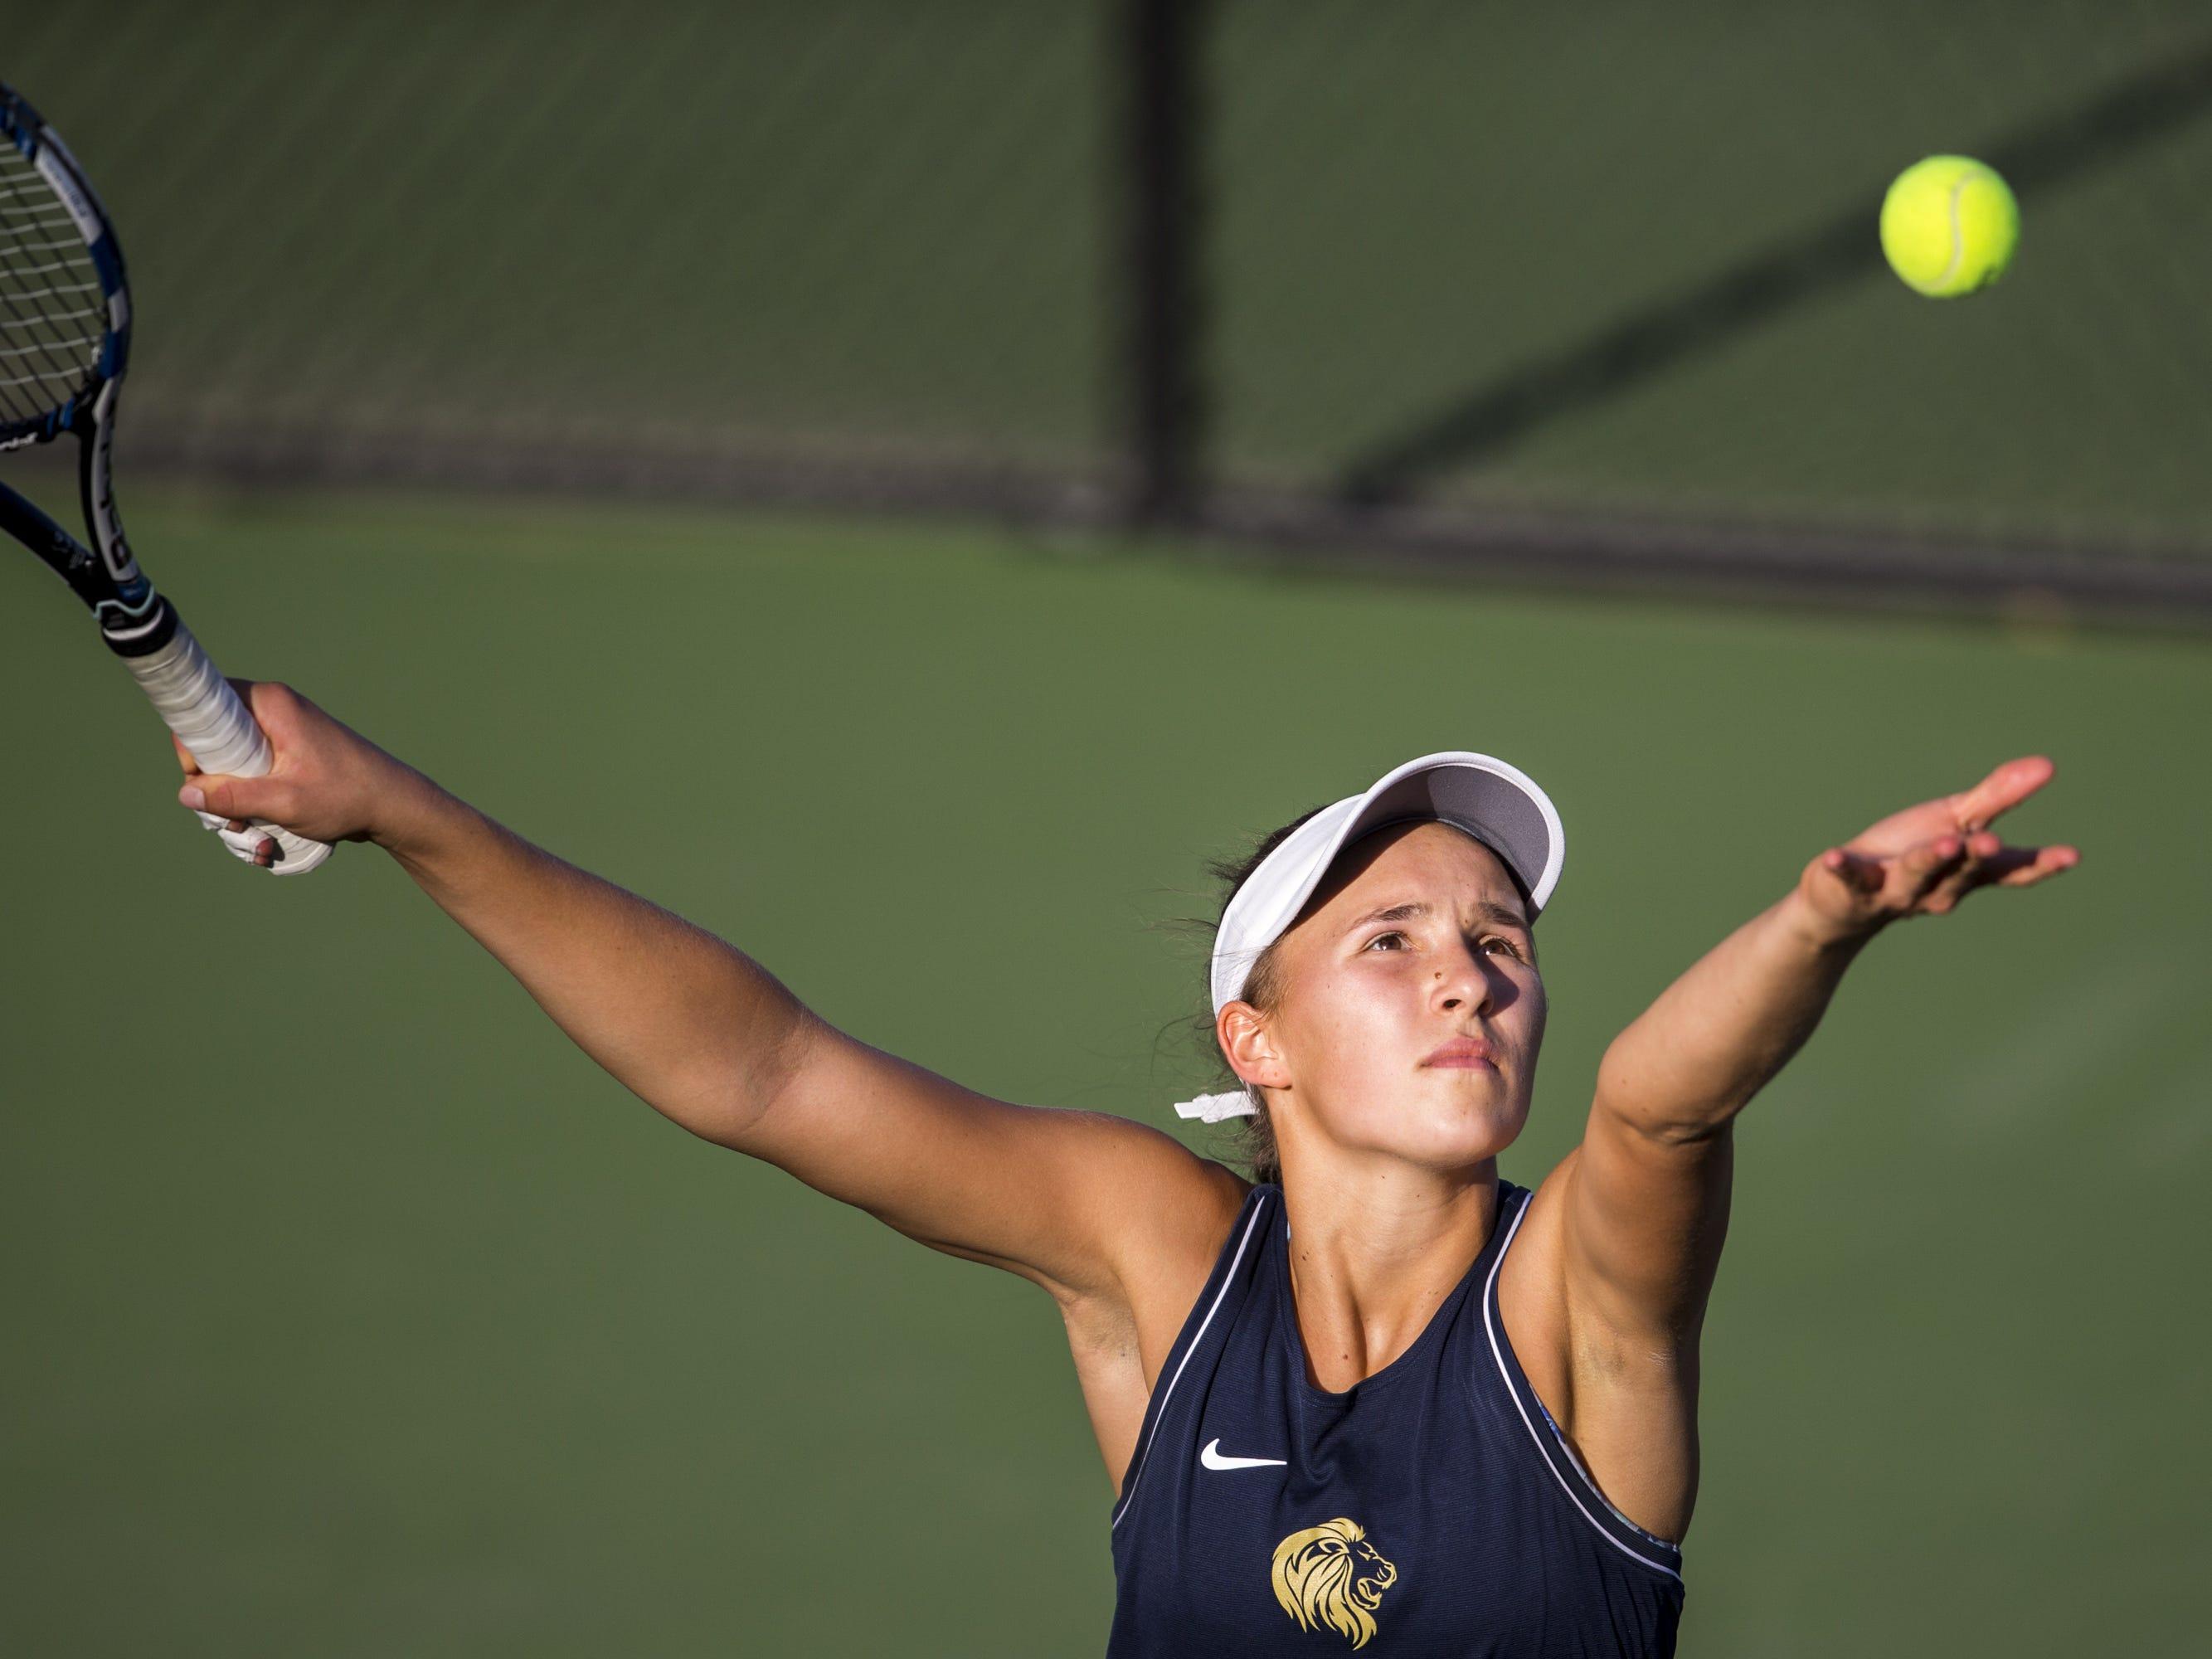 Pusch Ridge's Sofia Fetsis serves against Chandler Prep's Sangeet Bhalla during the Division III Girls Tennis Singles State Championship on Monday, April 29, 2019, at Whiteman Tennis Center in Tempe, Ariz.